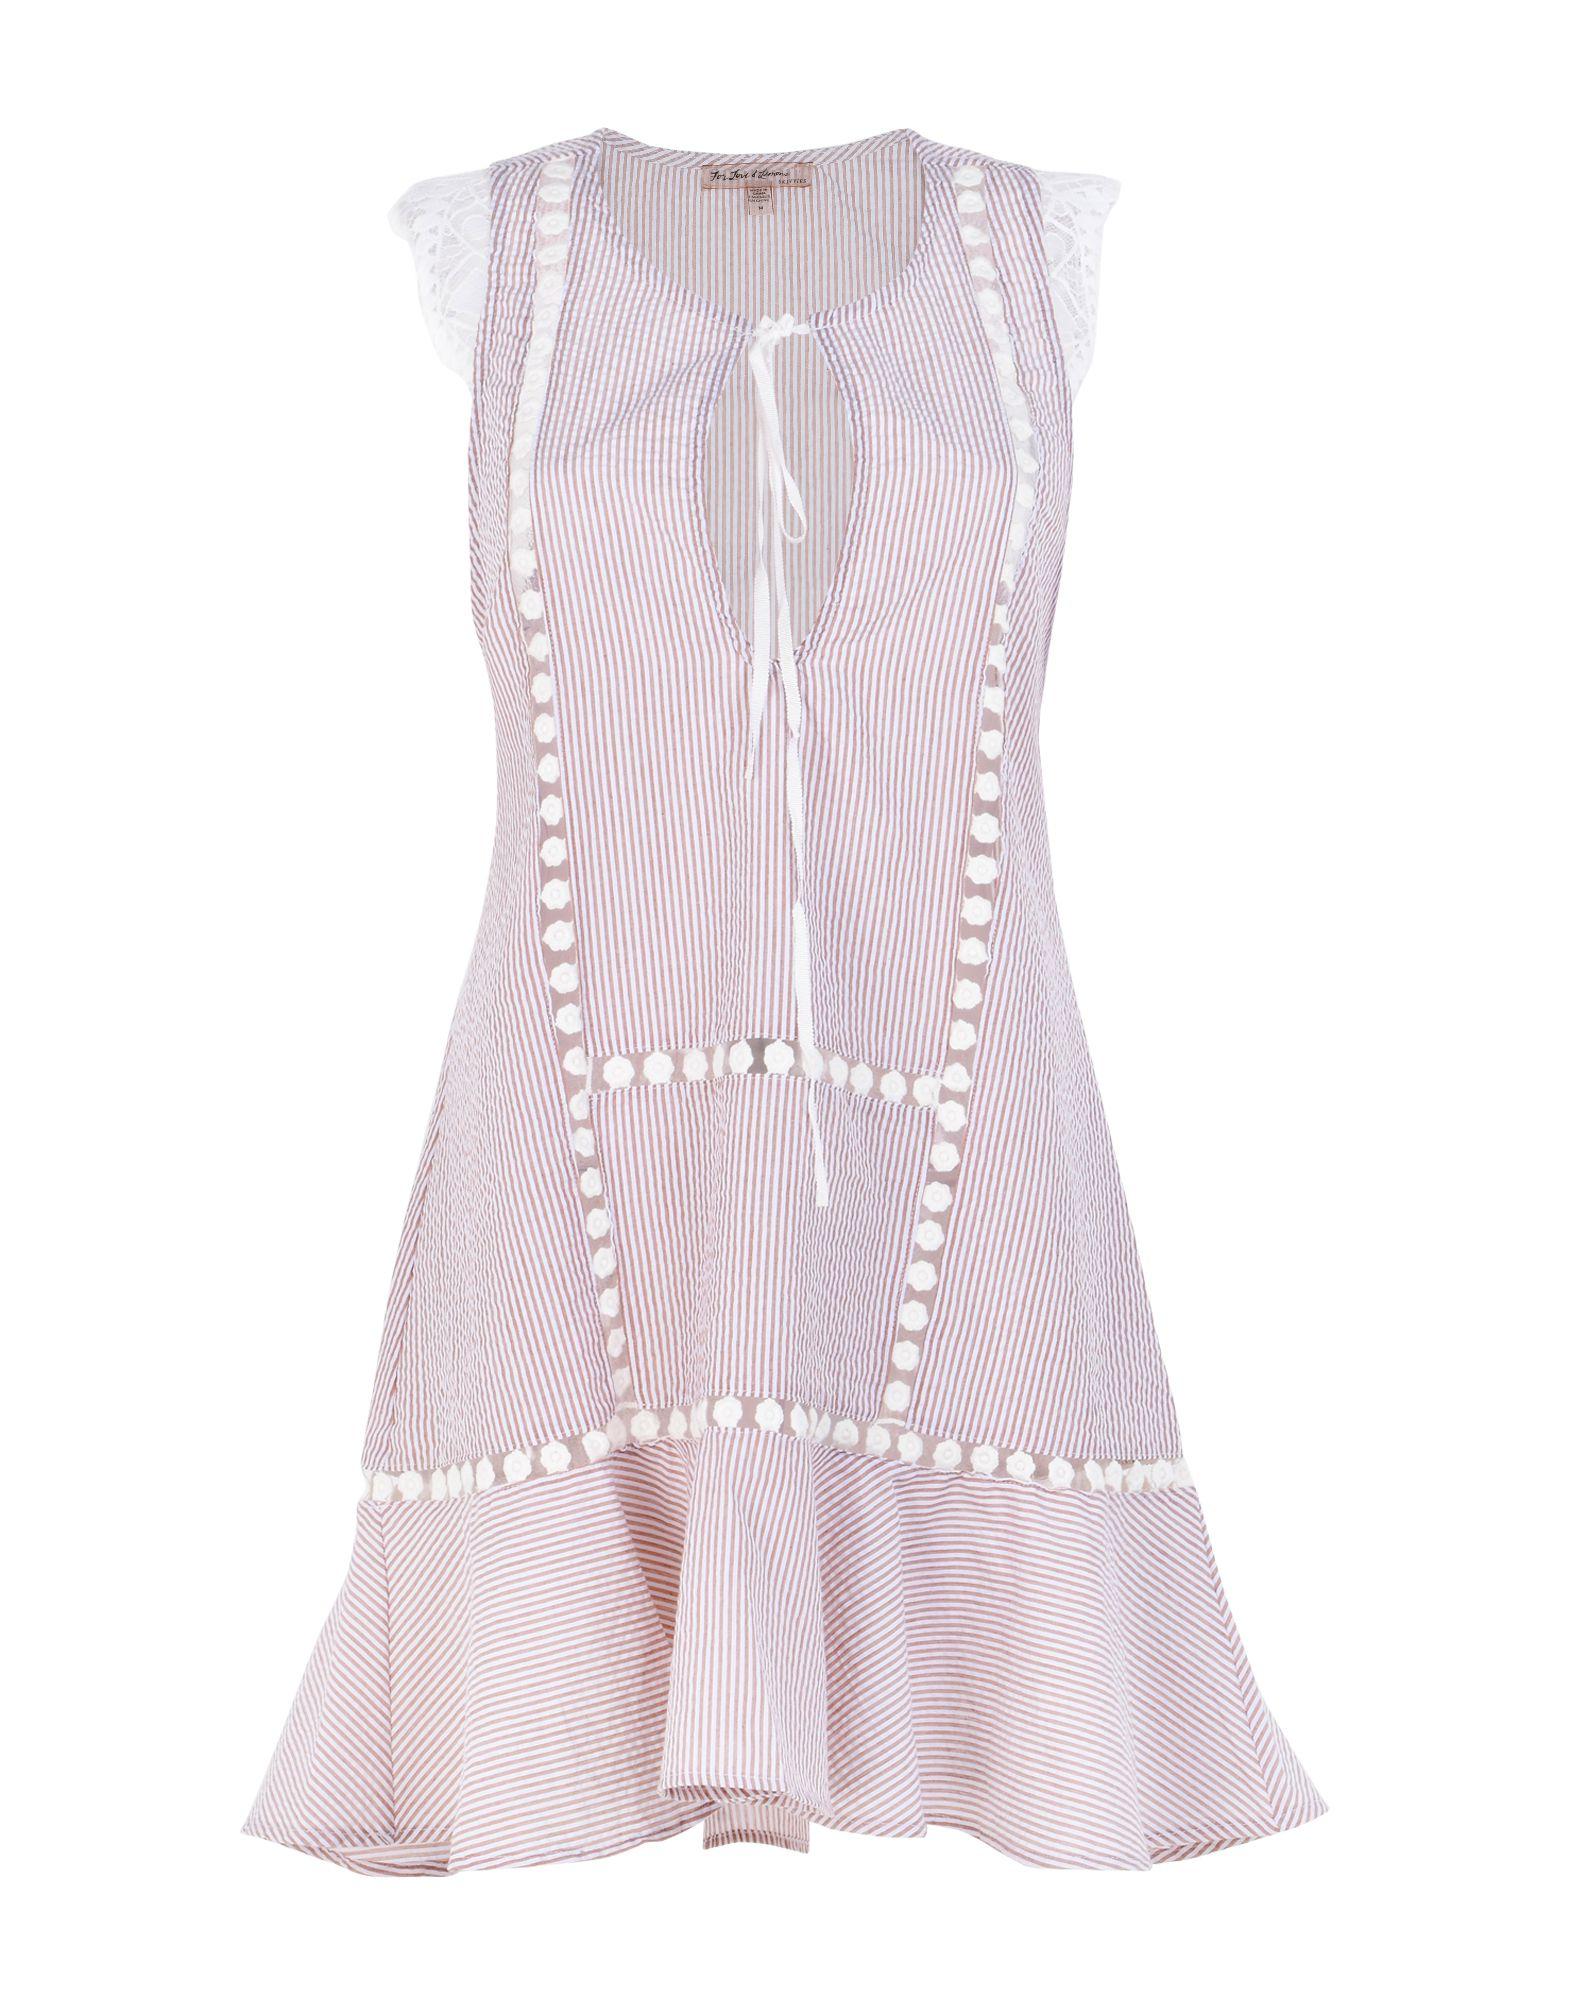 For Love & Lemons Nightgowns